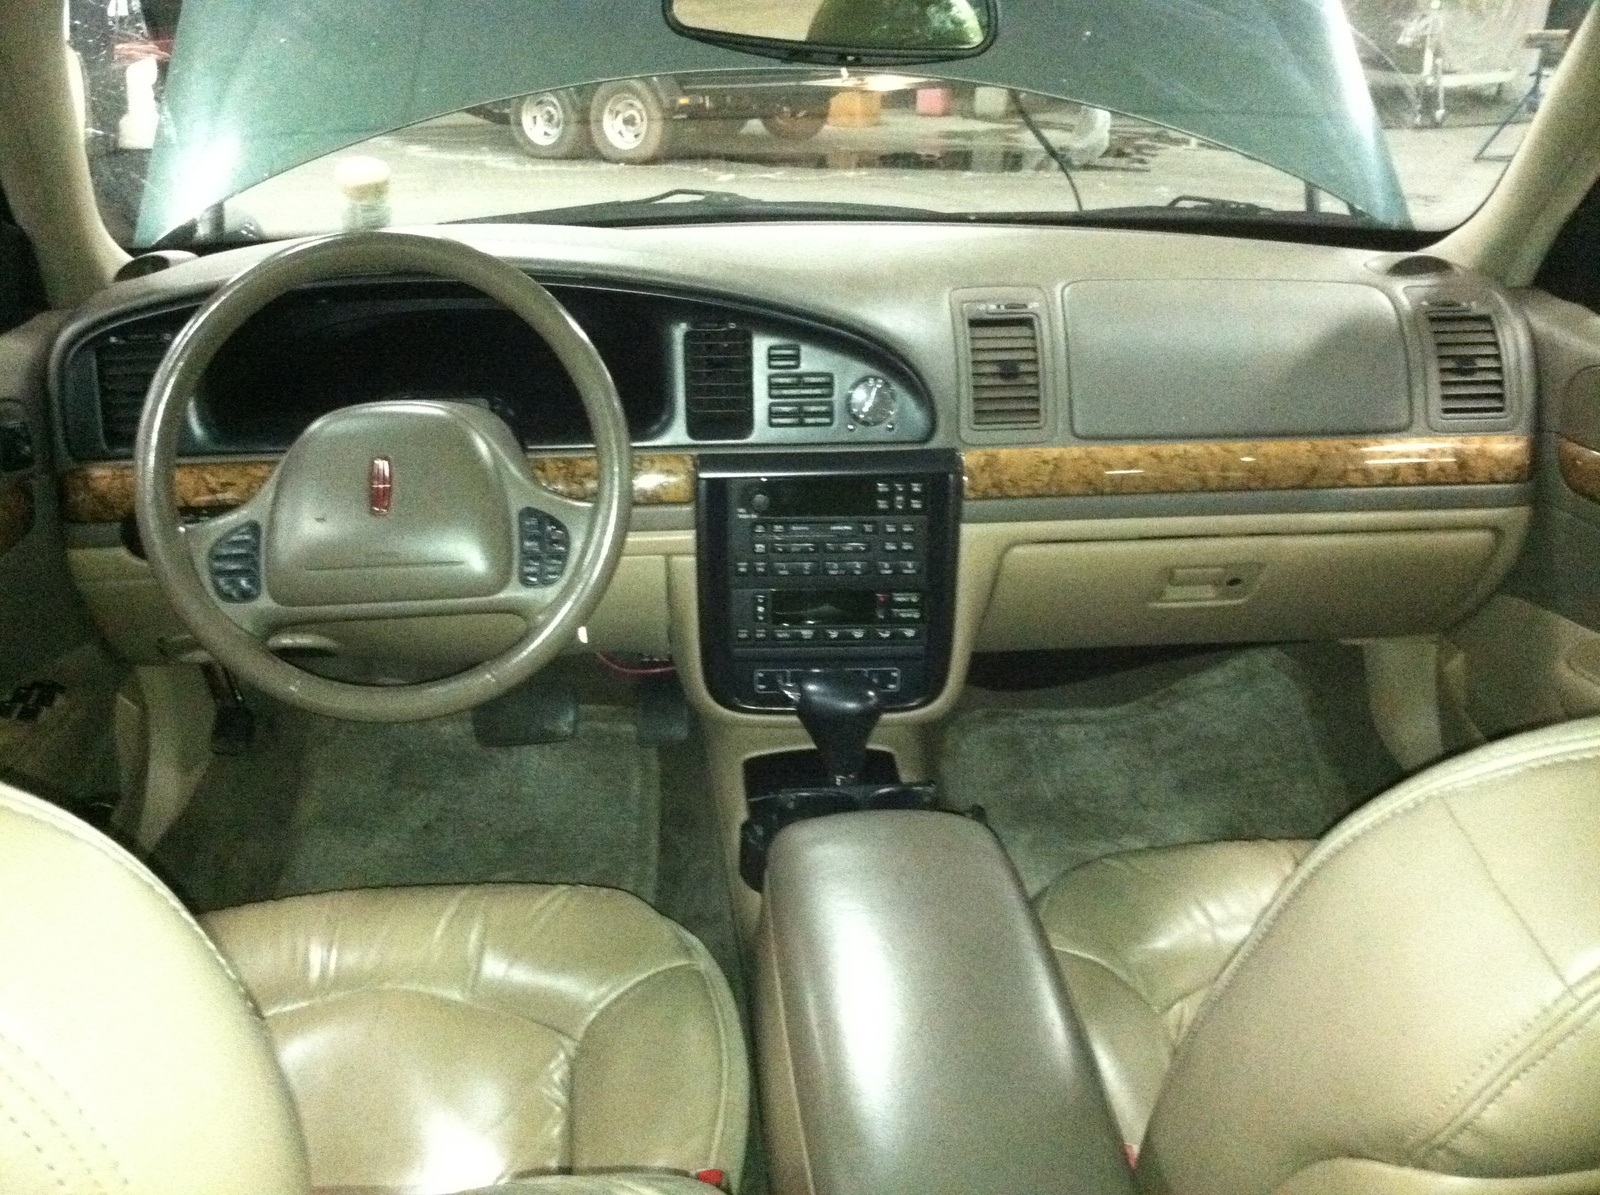 1999 Lincoln Continental Interior Pictures Cargurus